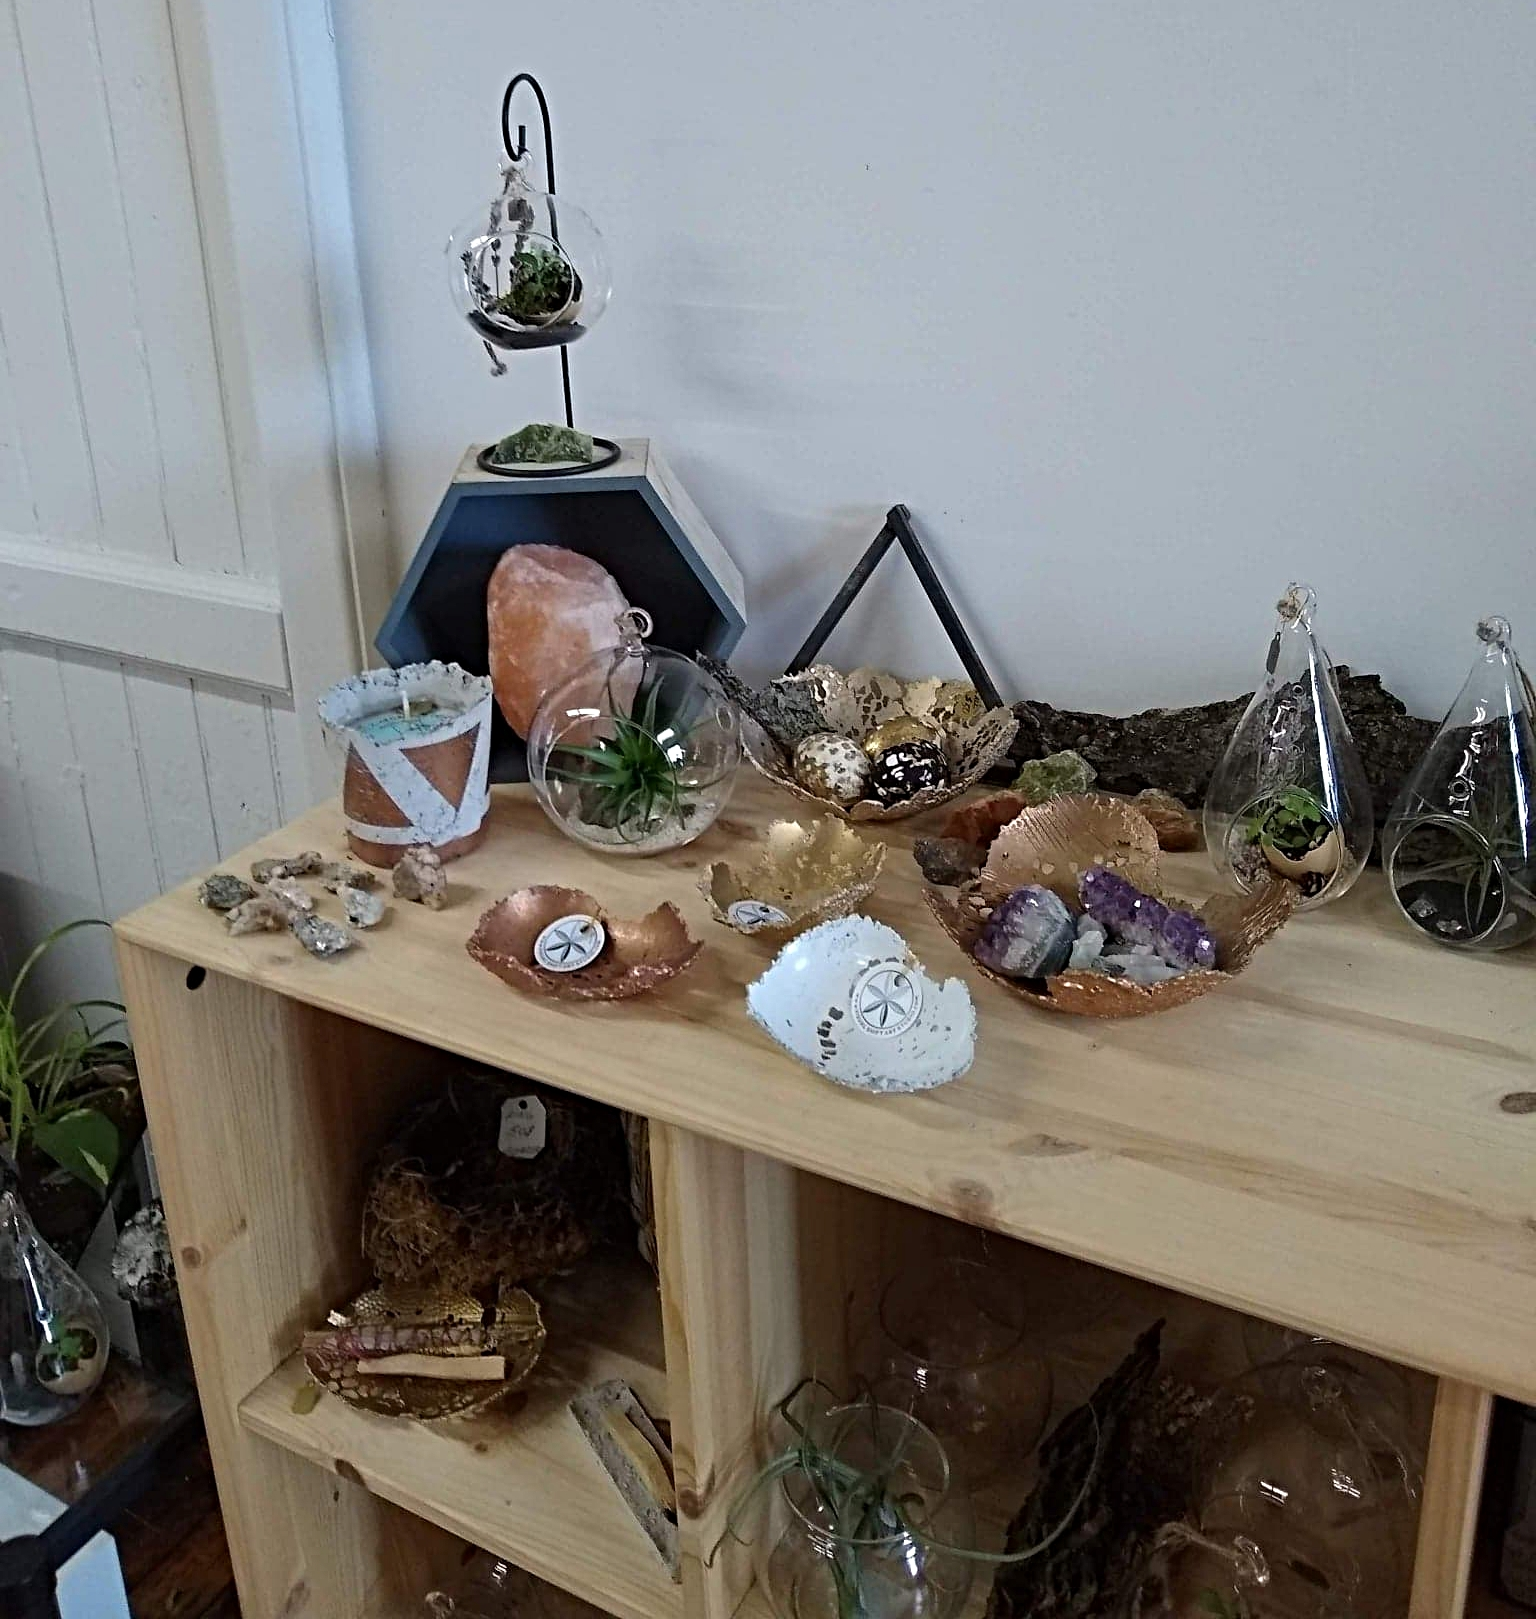 Some of Alyssa's sculptural work displayed in her studio - visit anytime at Hope Artiste Village Suite 1205!